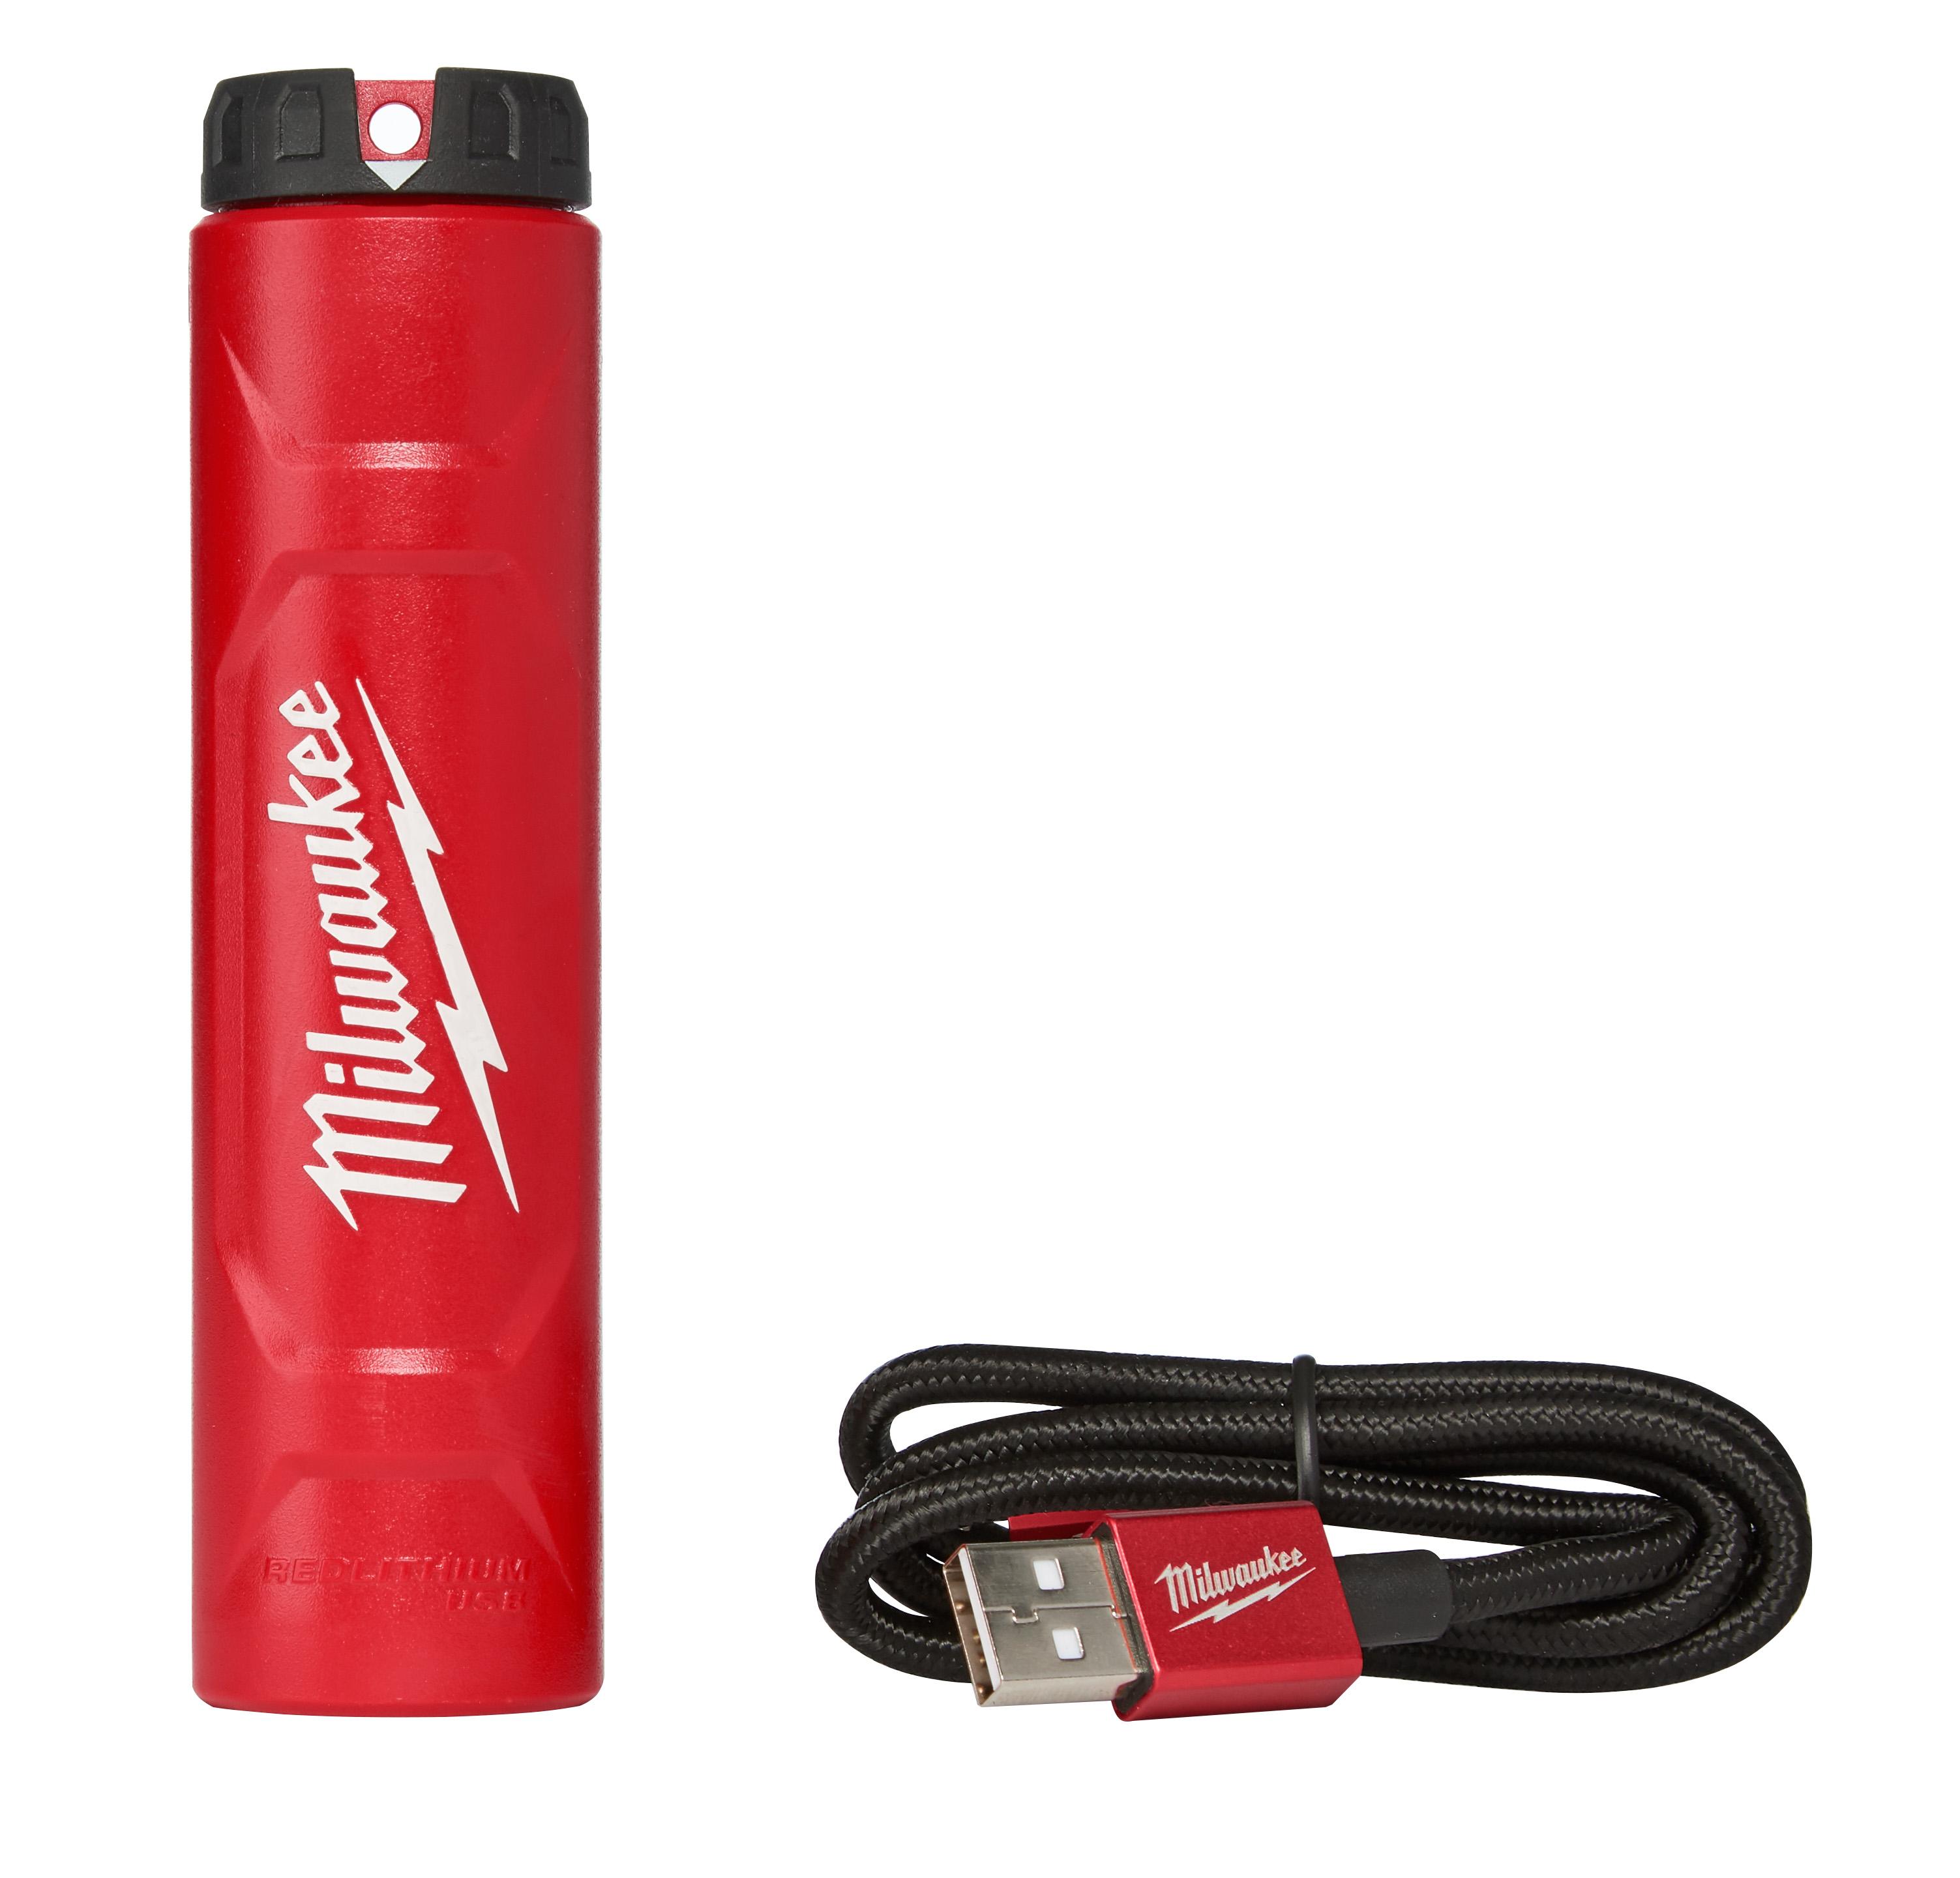 MIL 48-59-2002 REDLITHIUM USB CHARGER